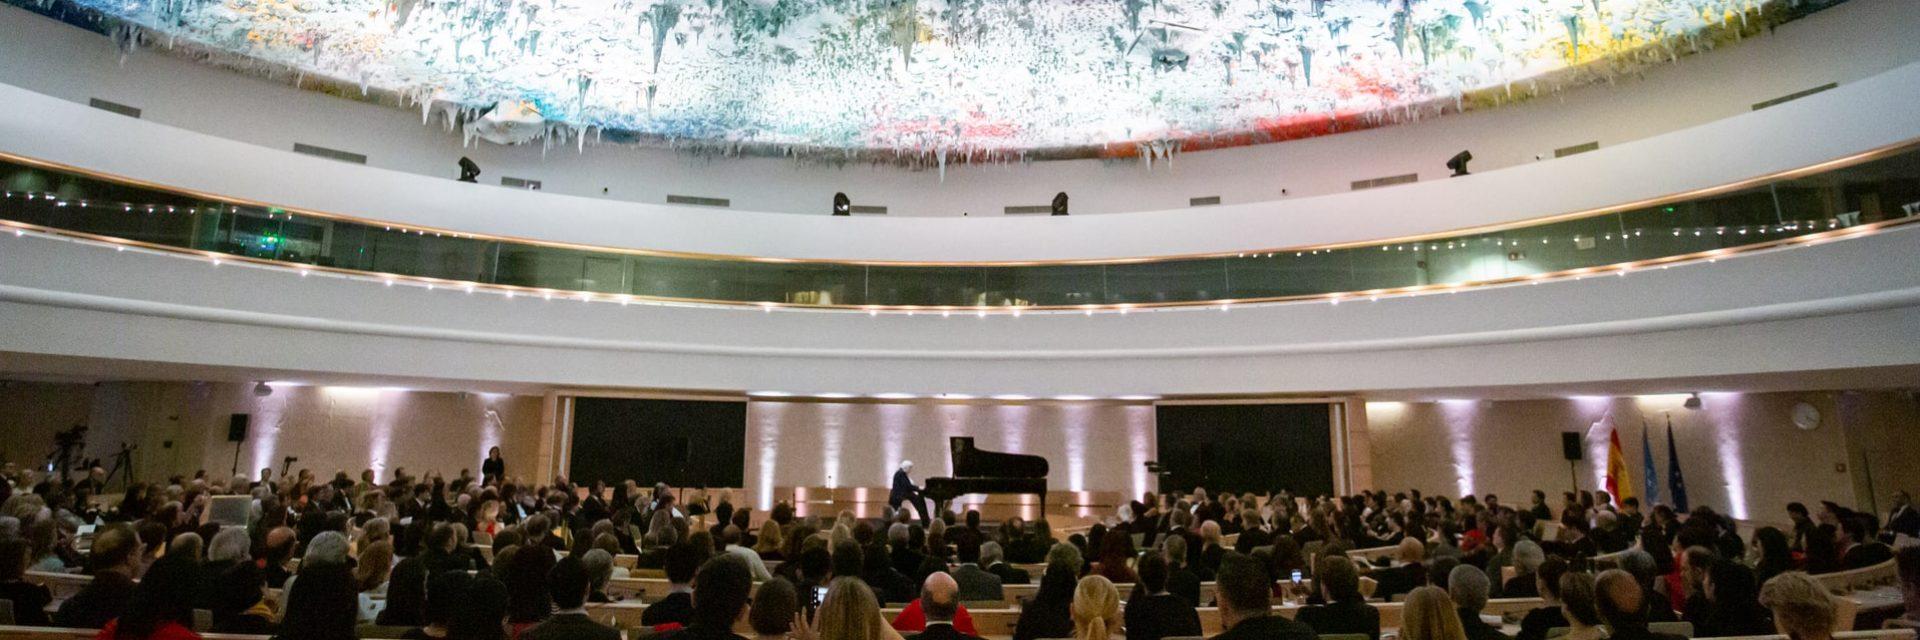 Human Rights Concert 2019